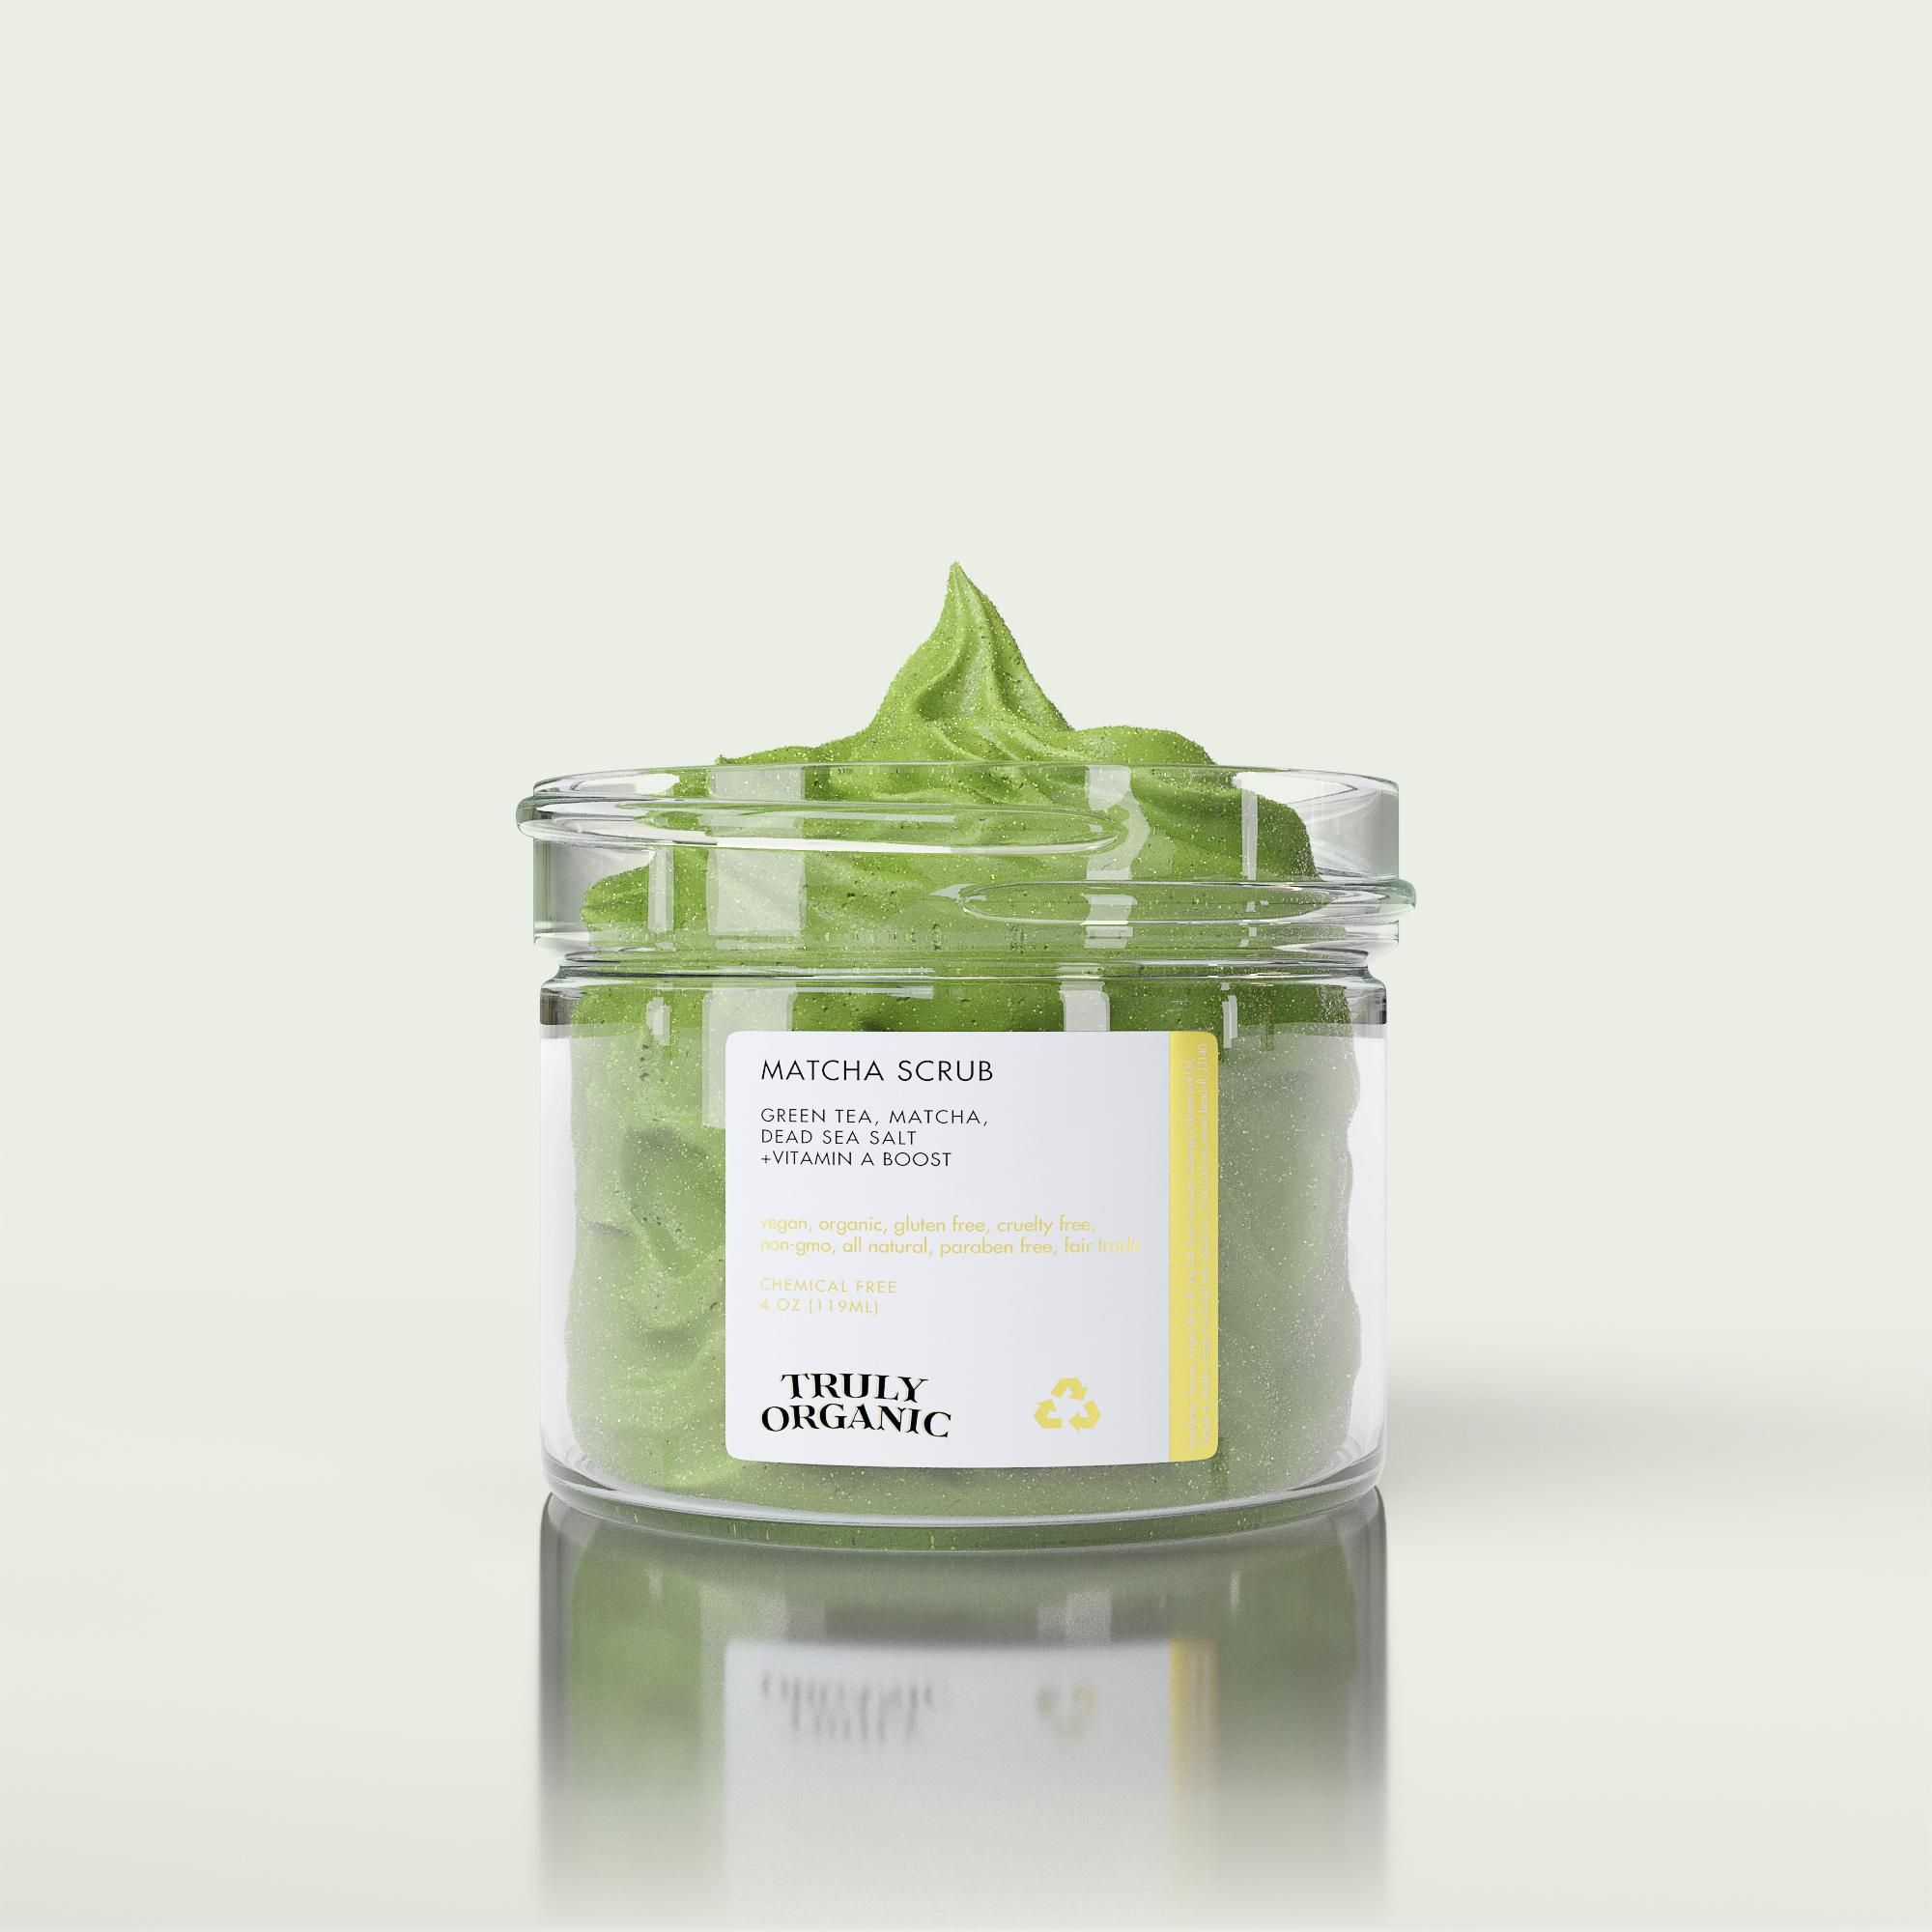 Truly Organic - Matcha Face Scrub